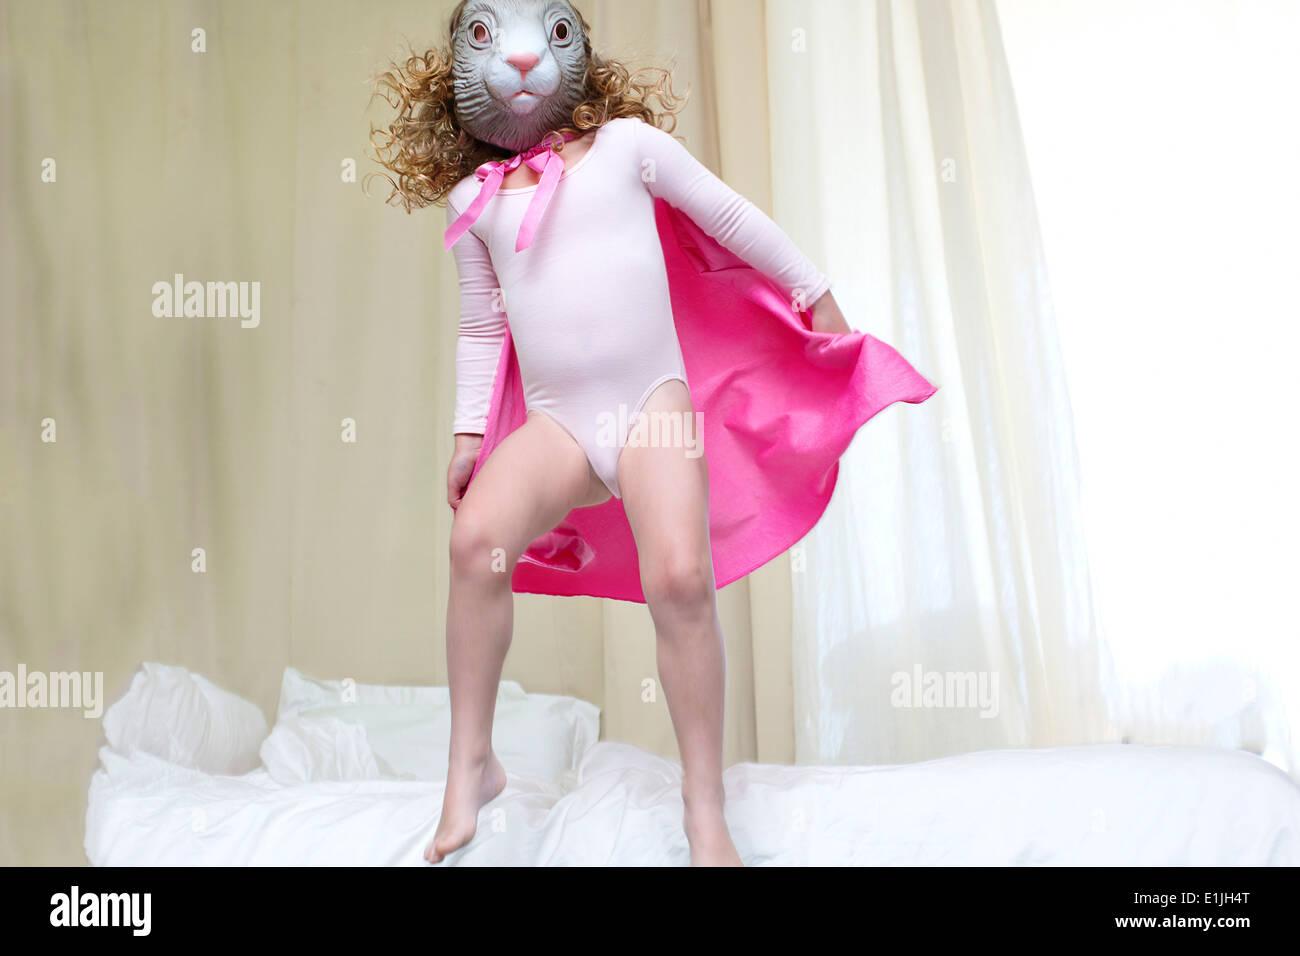 Jeune fille habillé en princesse lapin dancing on bed Photo Stock